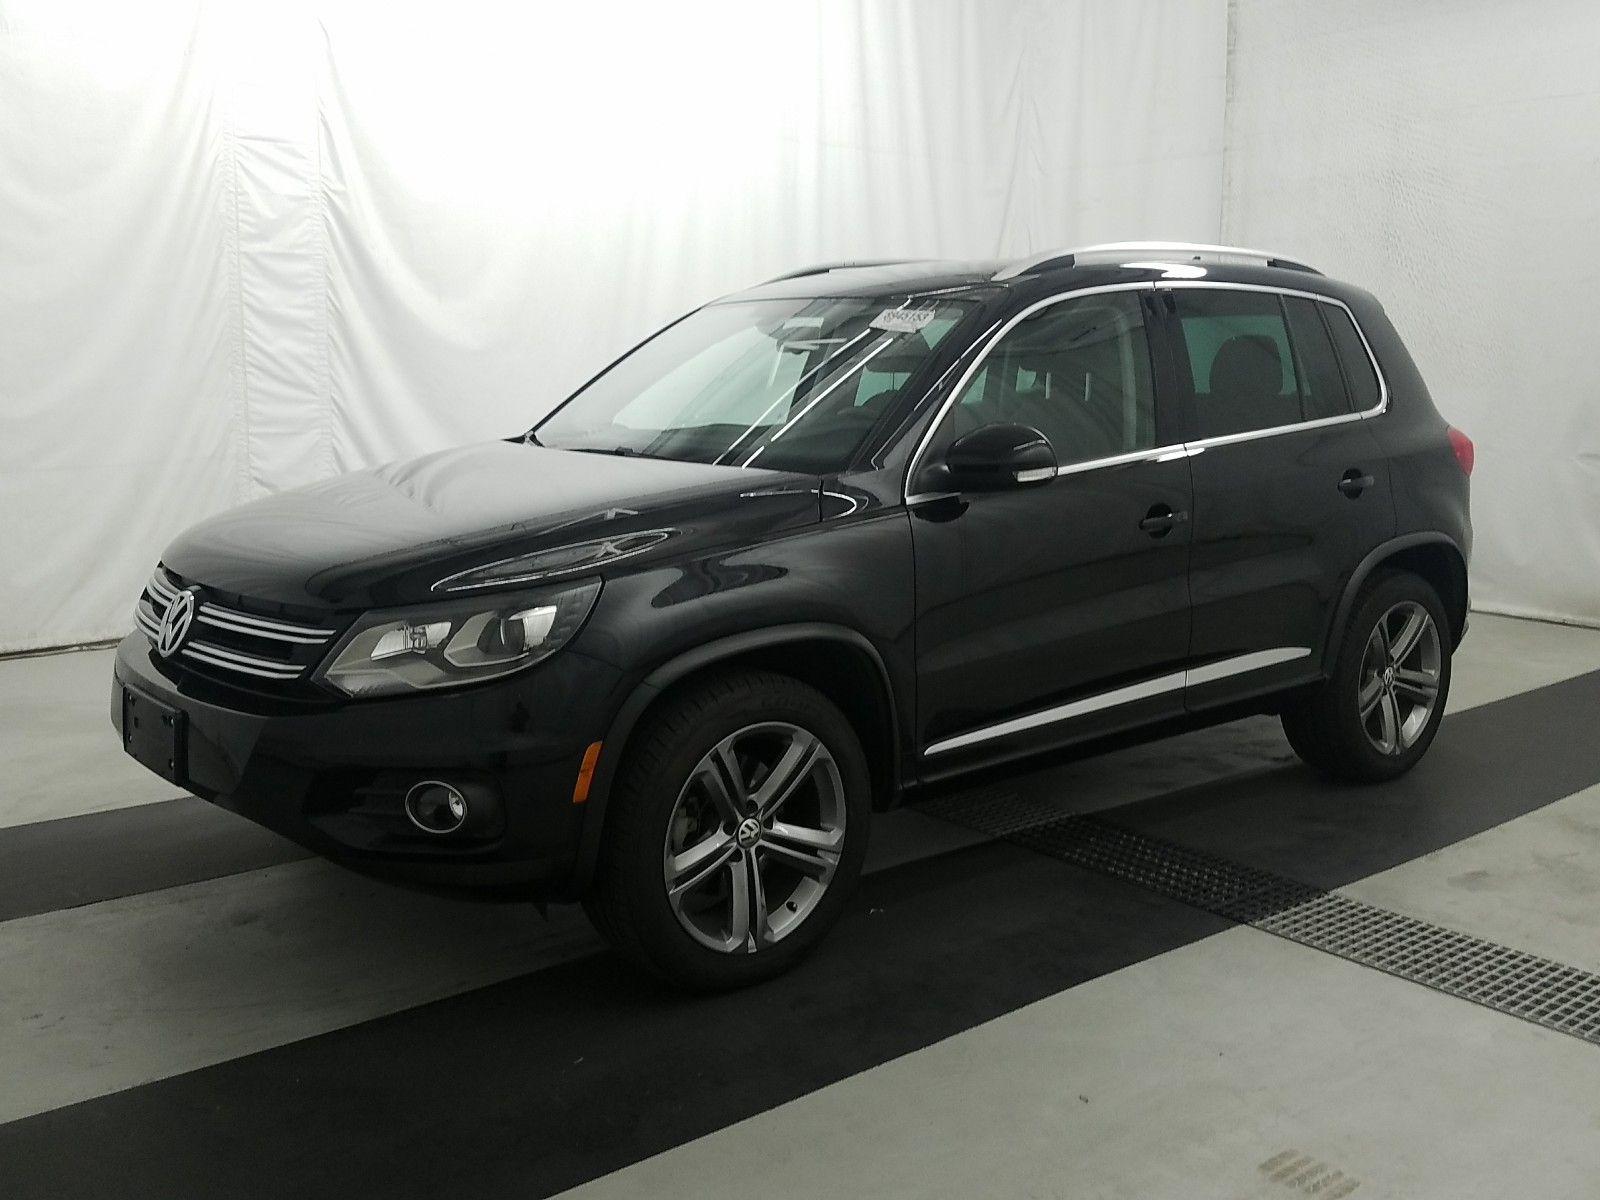 2017 Volkswagen Tiguan 2.0. Lot 99913385779 Vin WVGTV7AX6HK014905